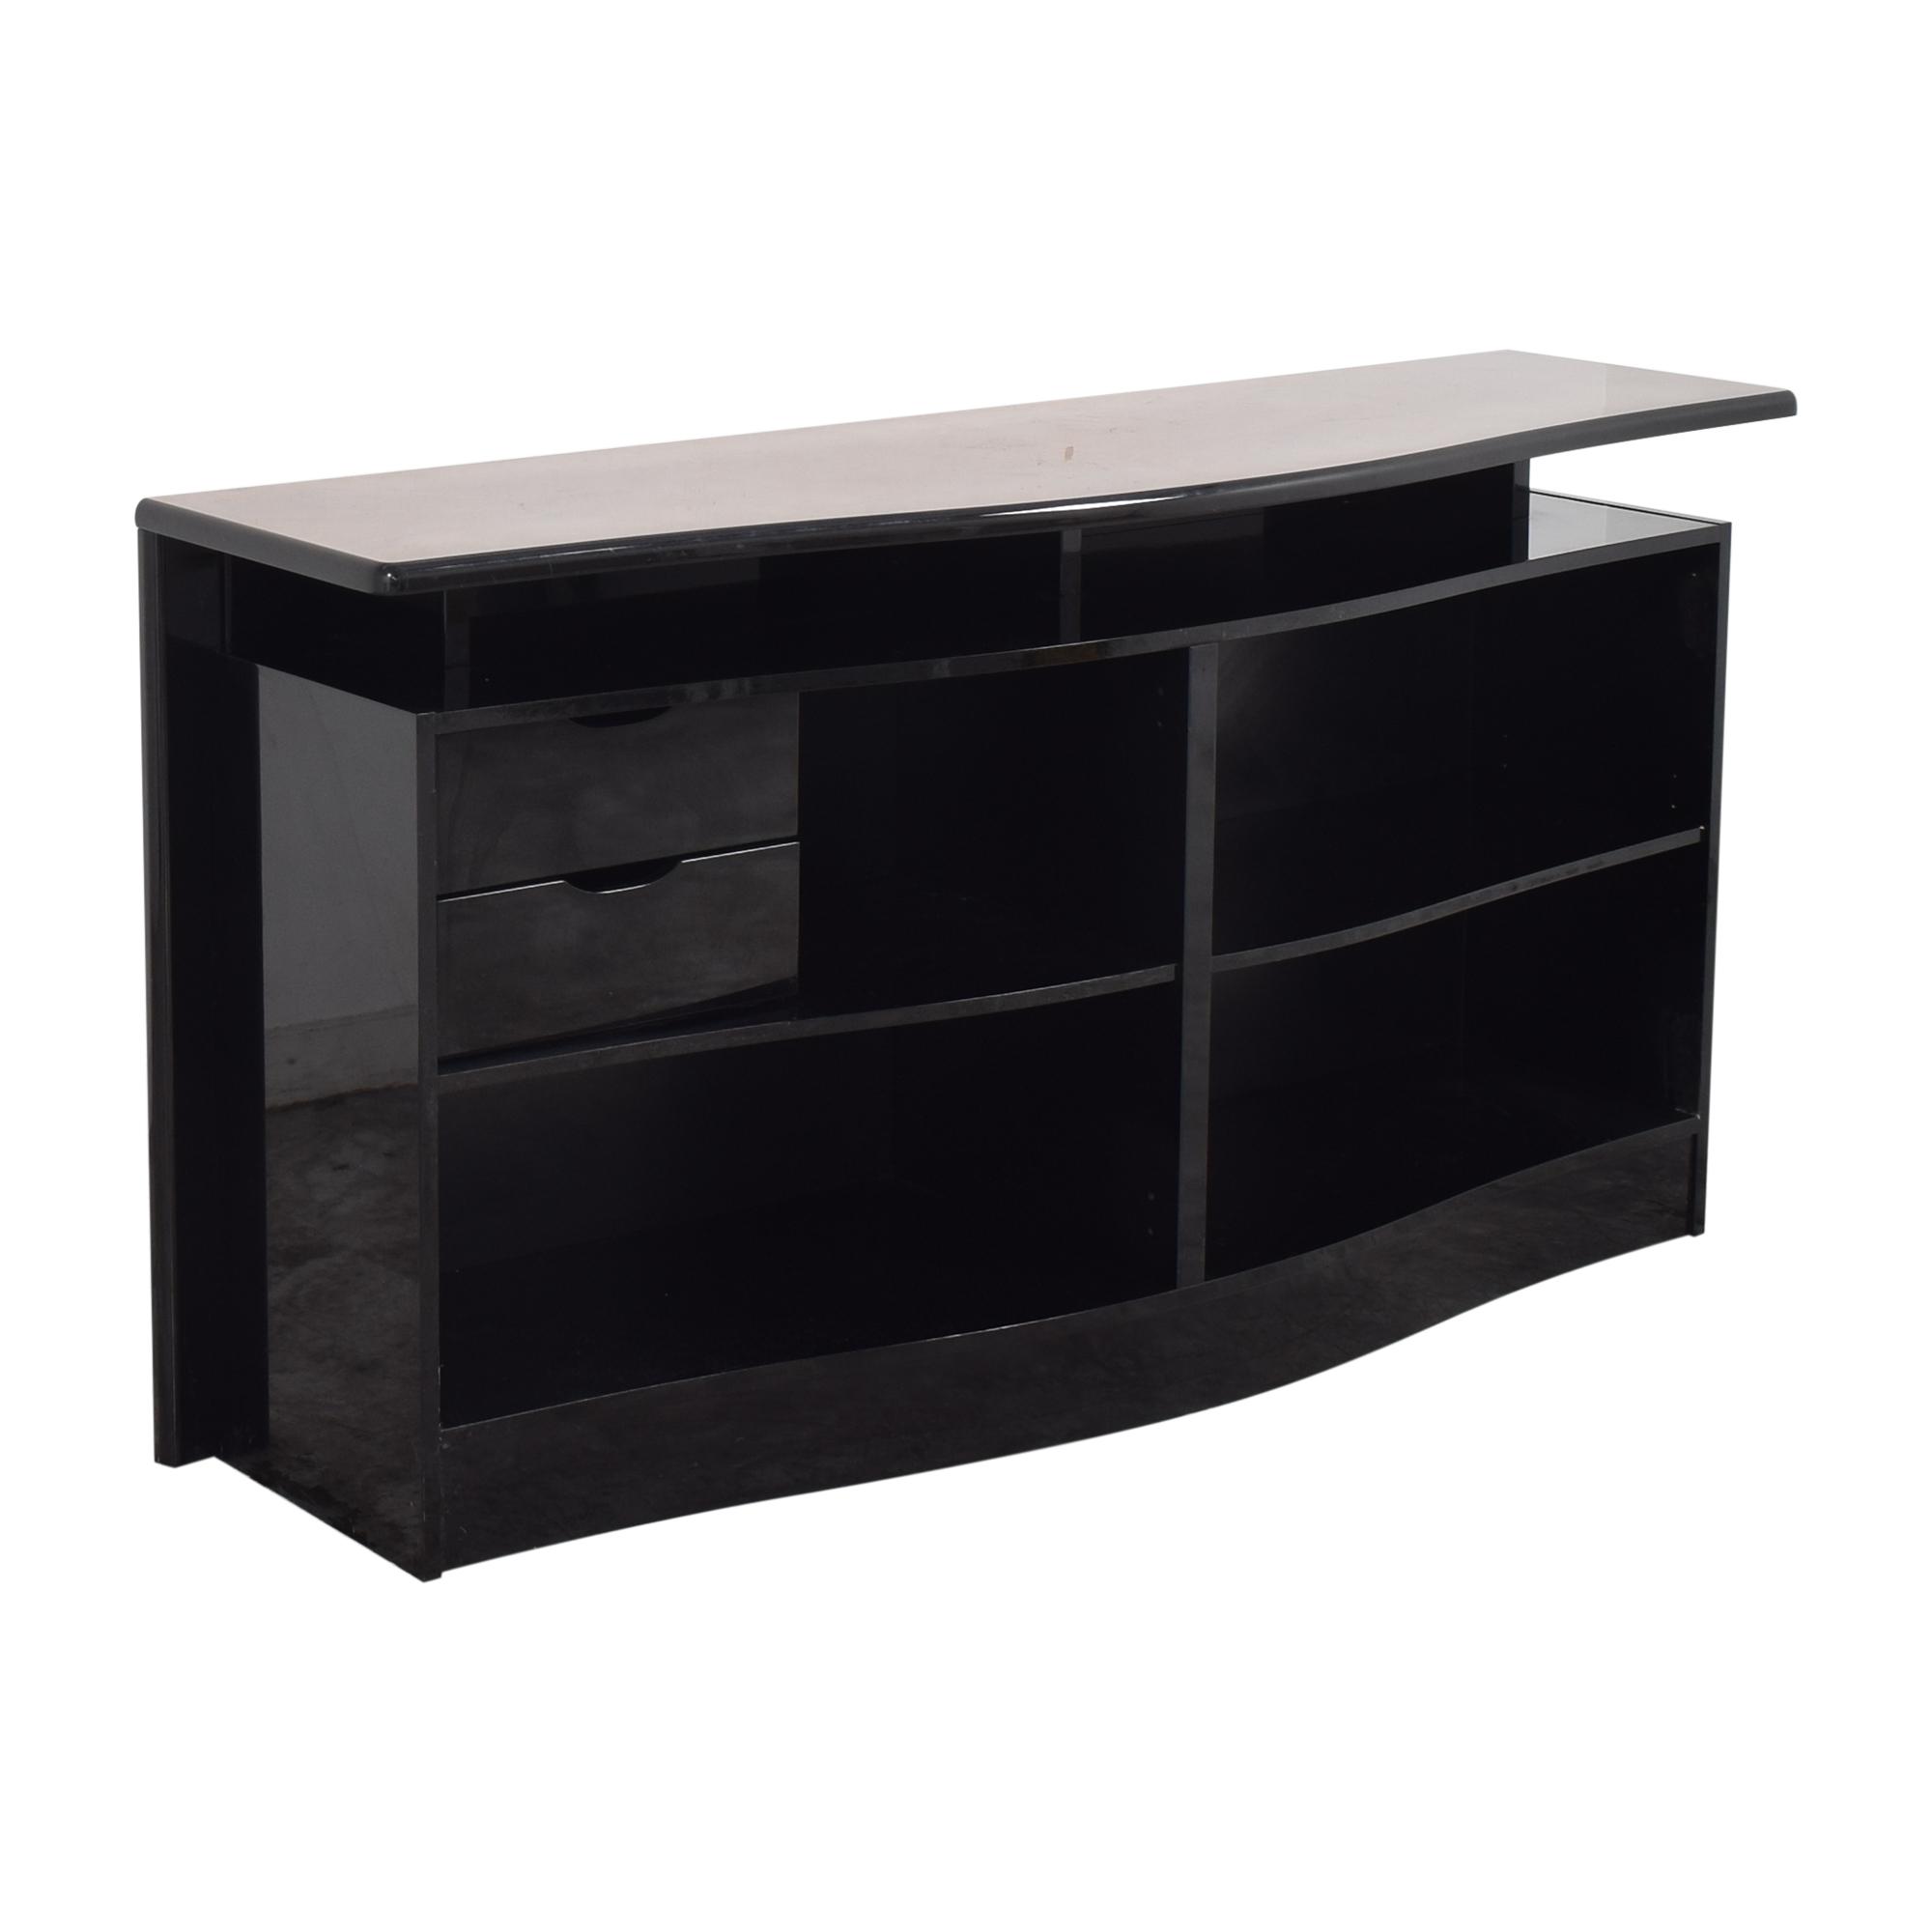 buy Excelsior Designs Cubby Sideboard Excelsior Designs